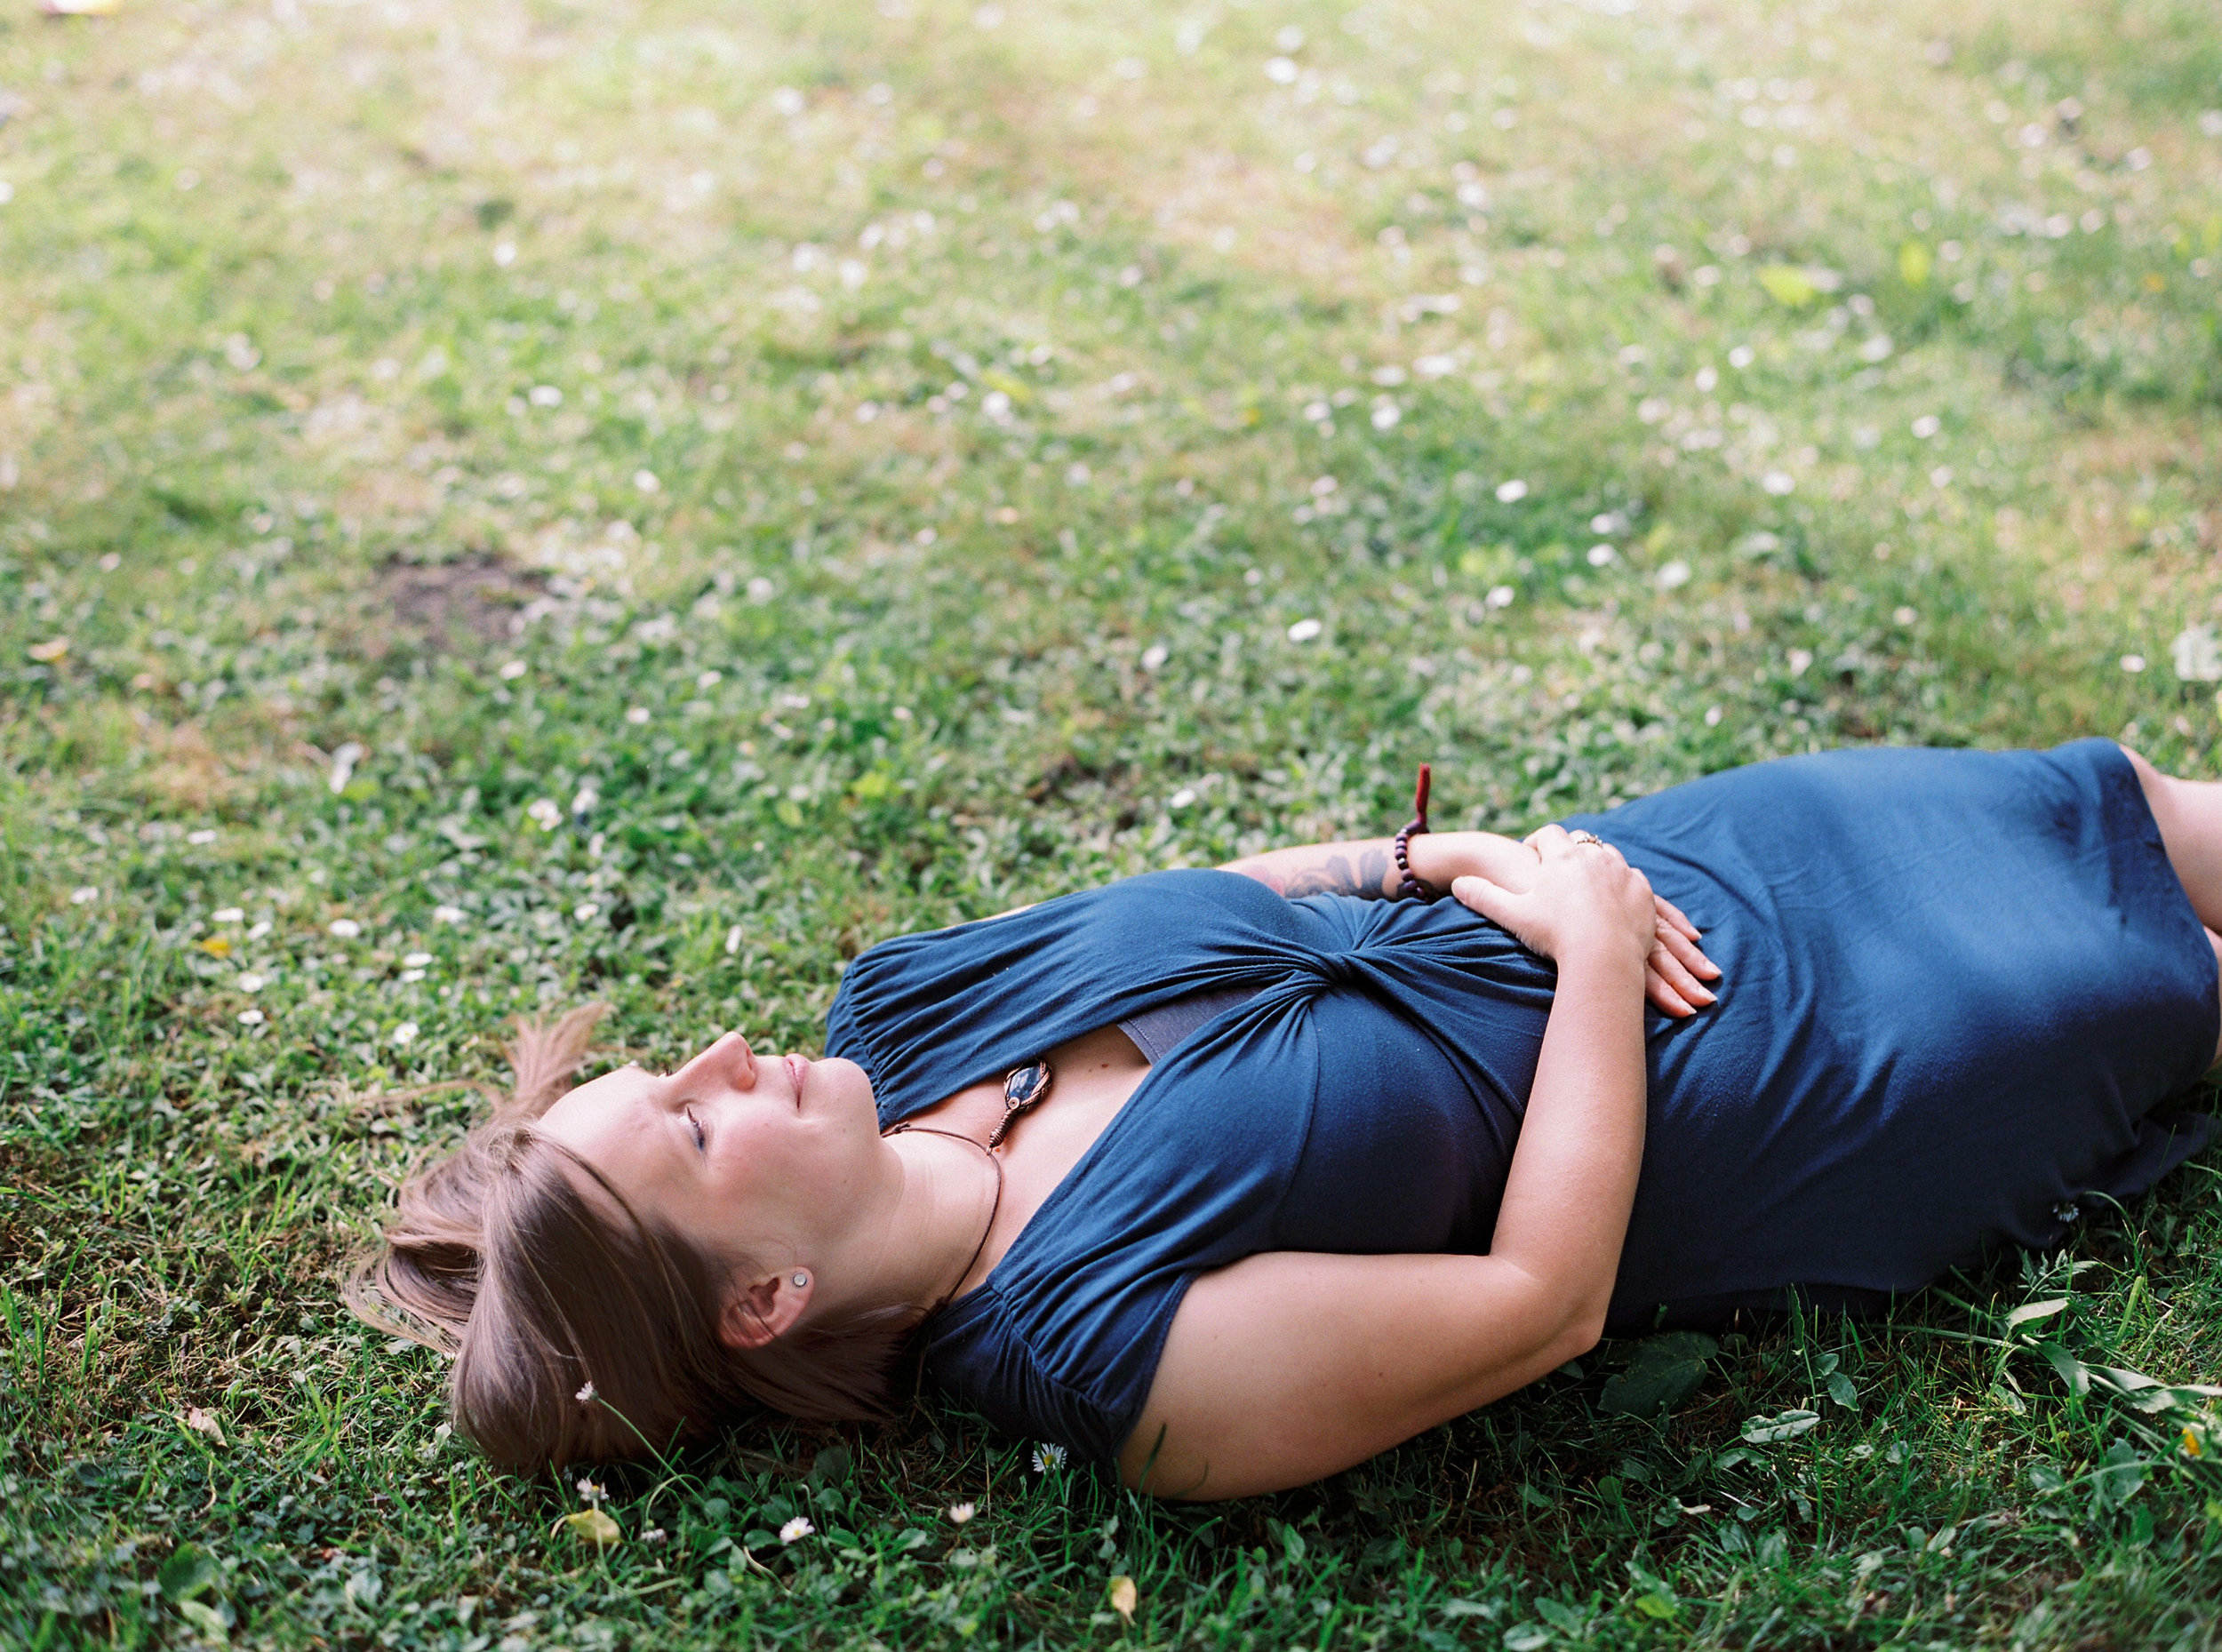 cumbria-commercial-photographer (48).jpg